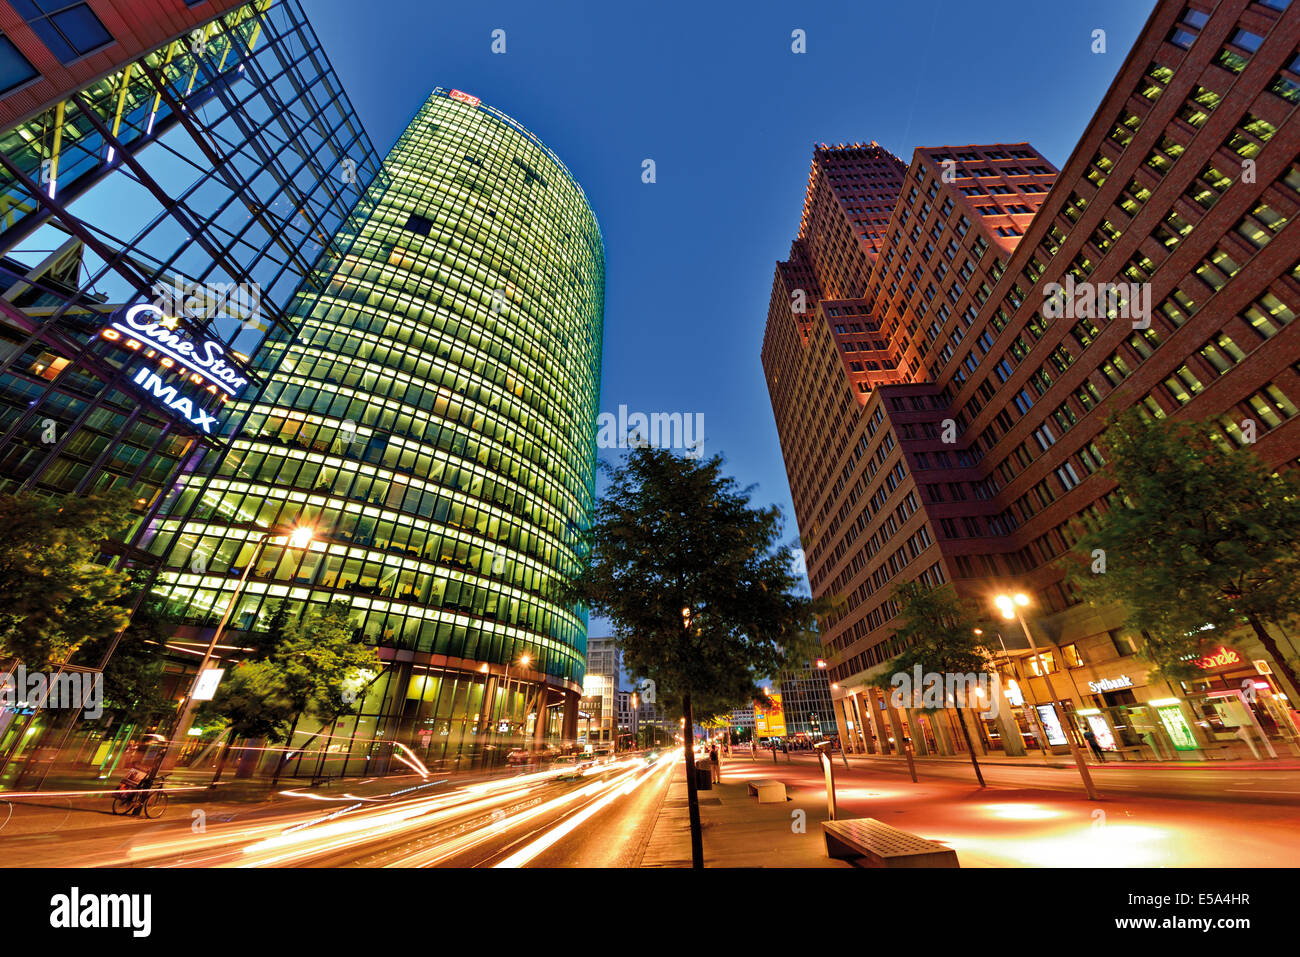 Deutschland, Berlin: Nächtliche Blick auf den Potsdamer Platz (Potsdamer Platz) Stockbild